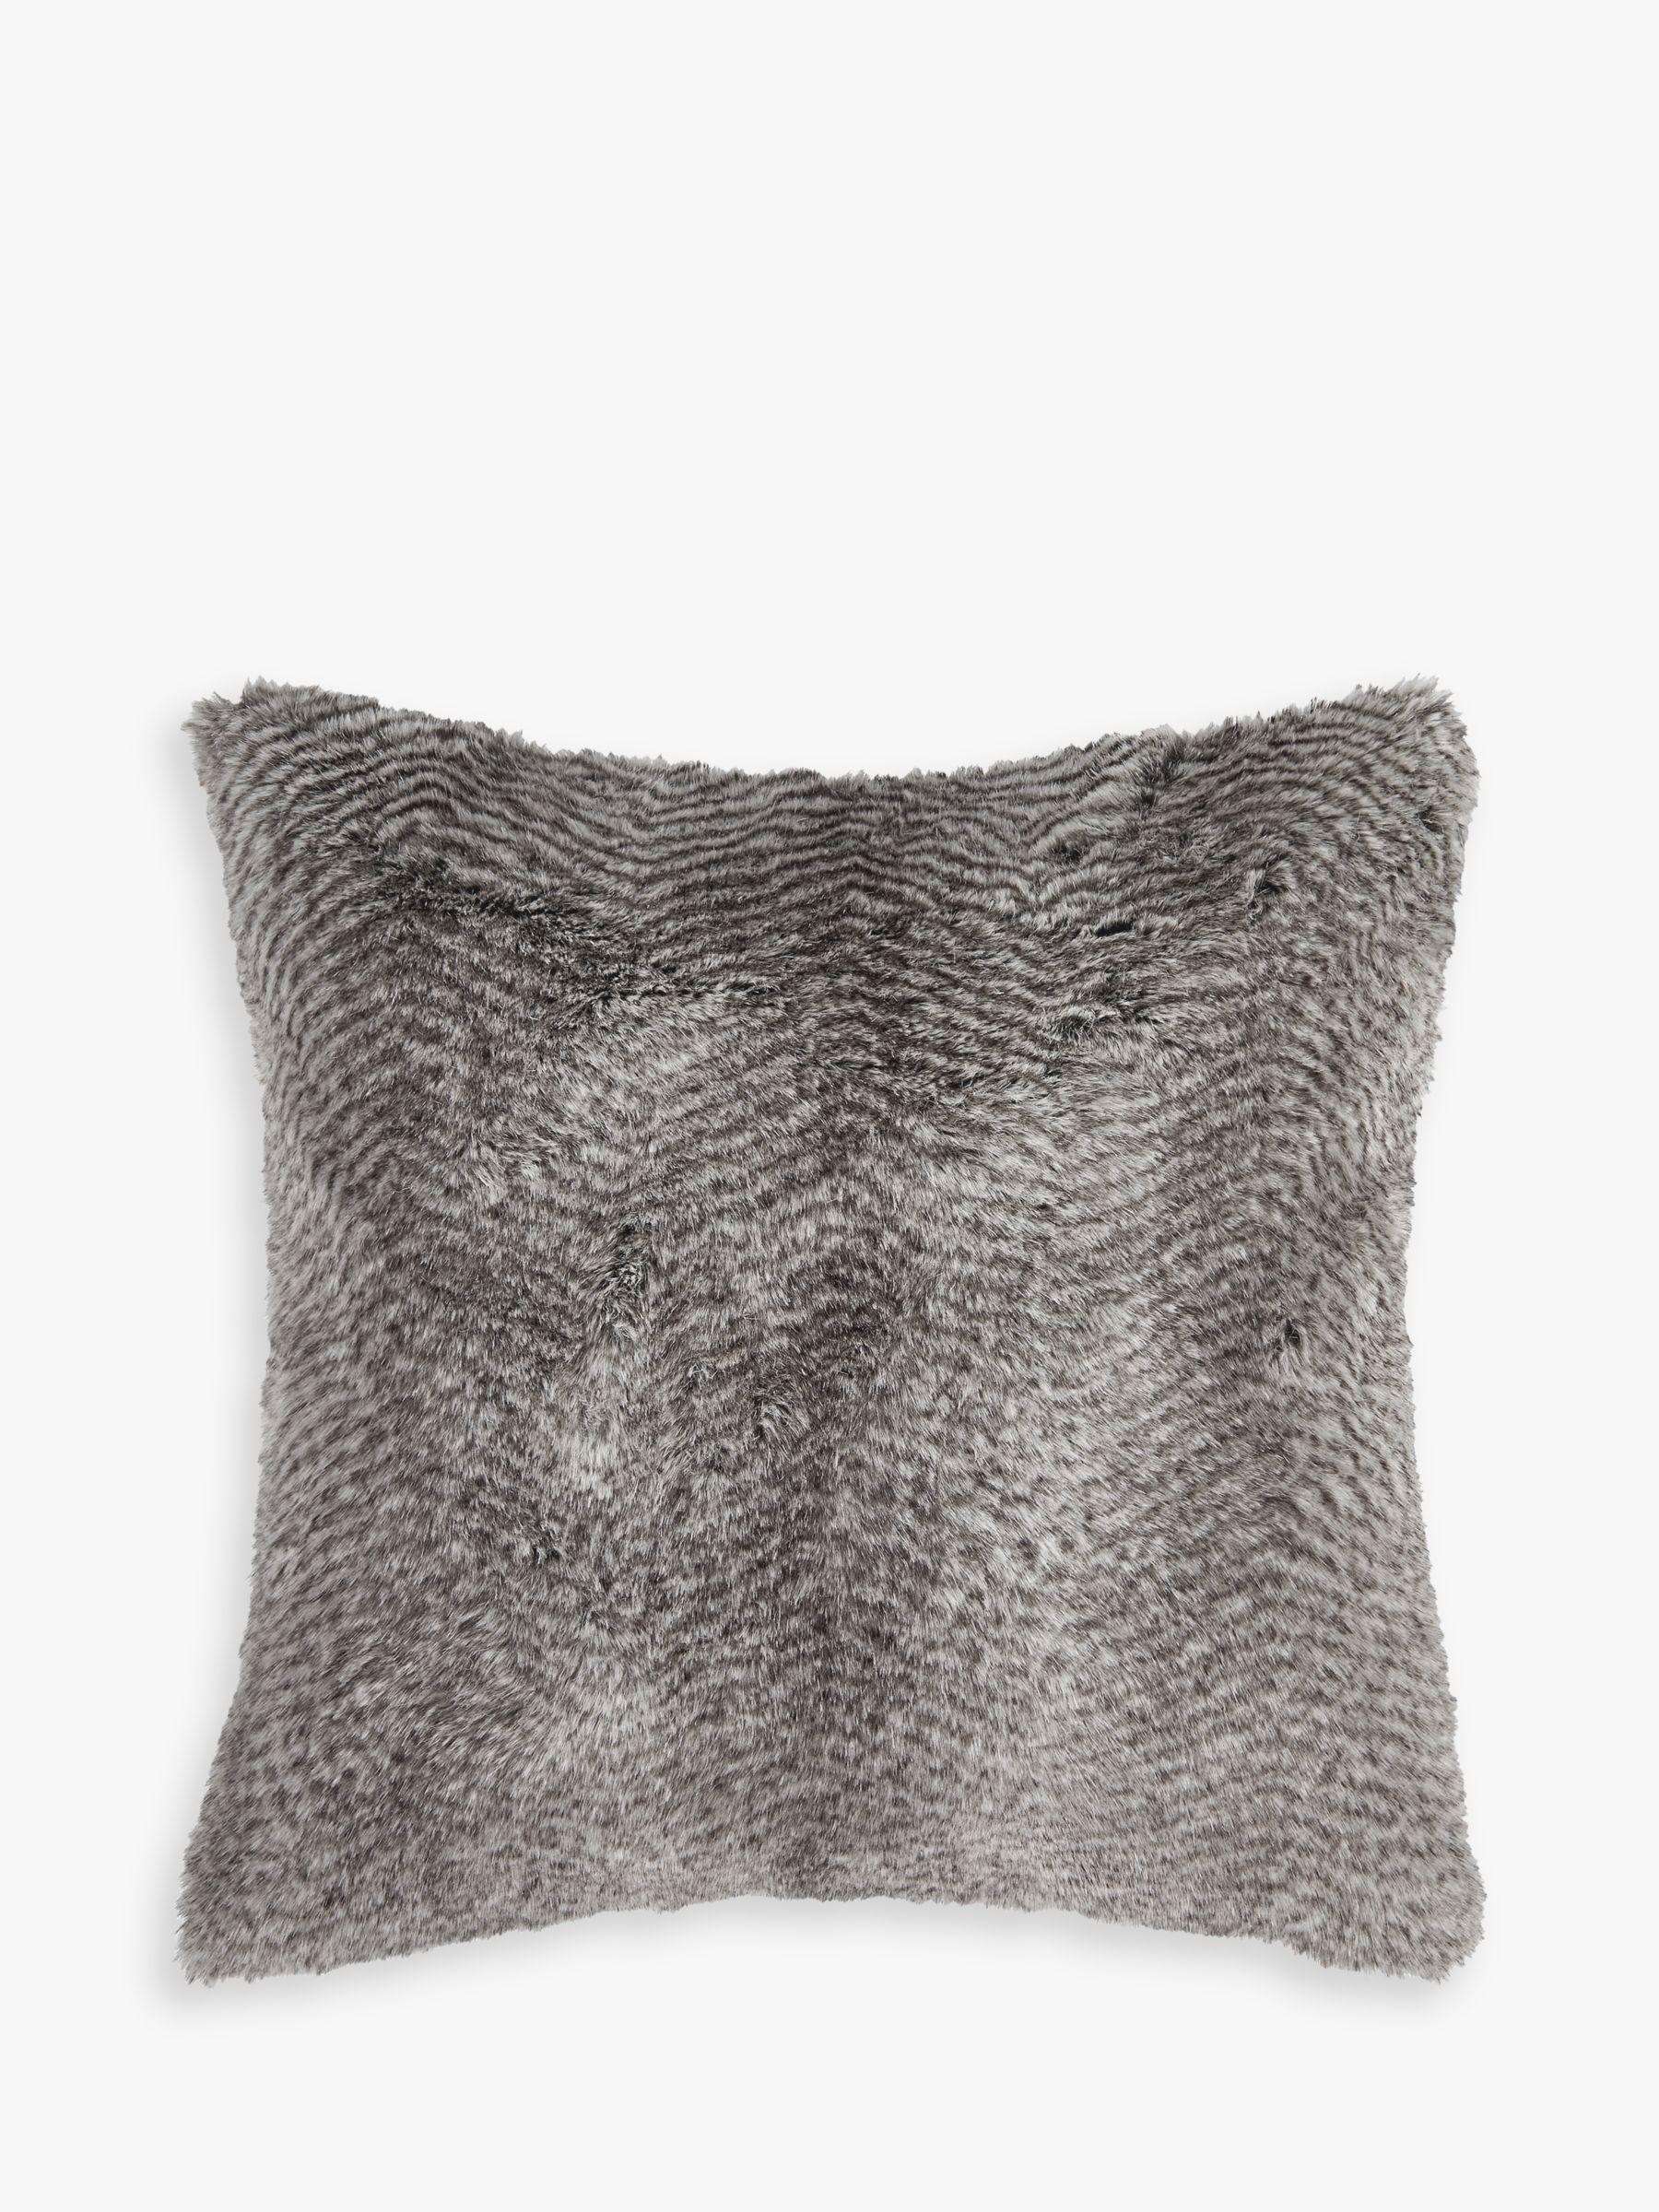 Helene Berman Helene Berman Chevron Rabbit Faux Fur Cushion, Grey